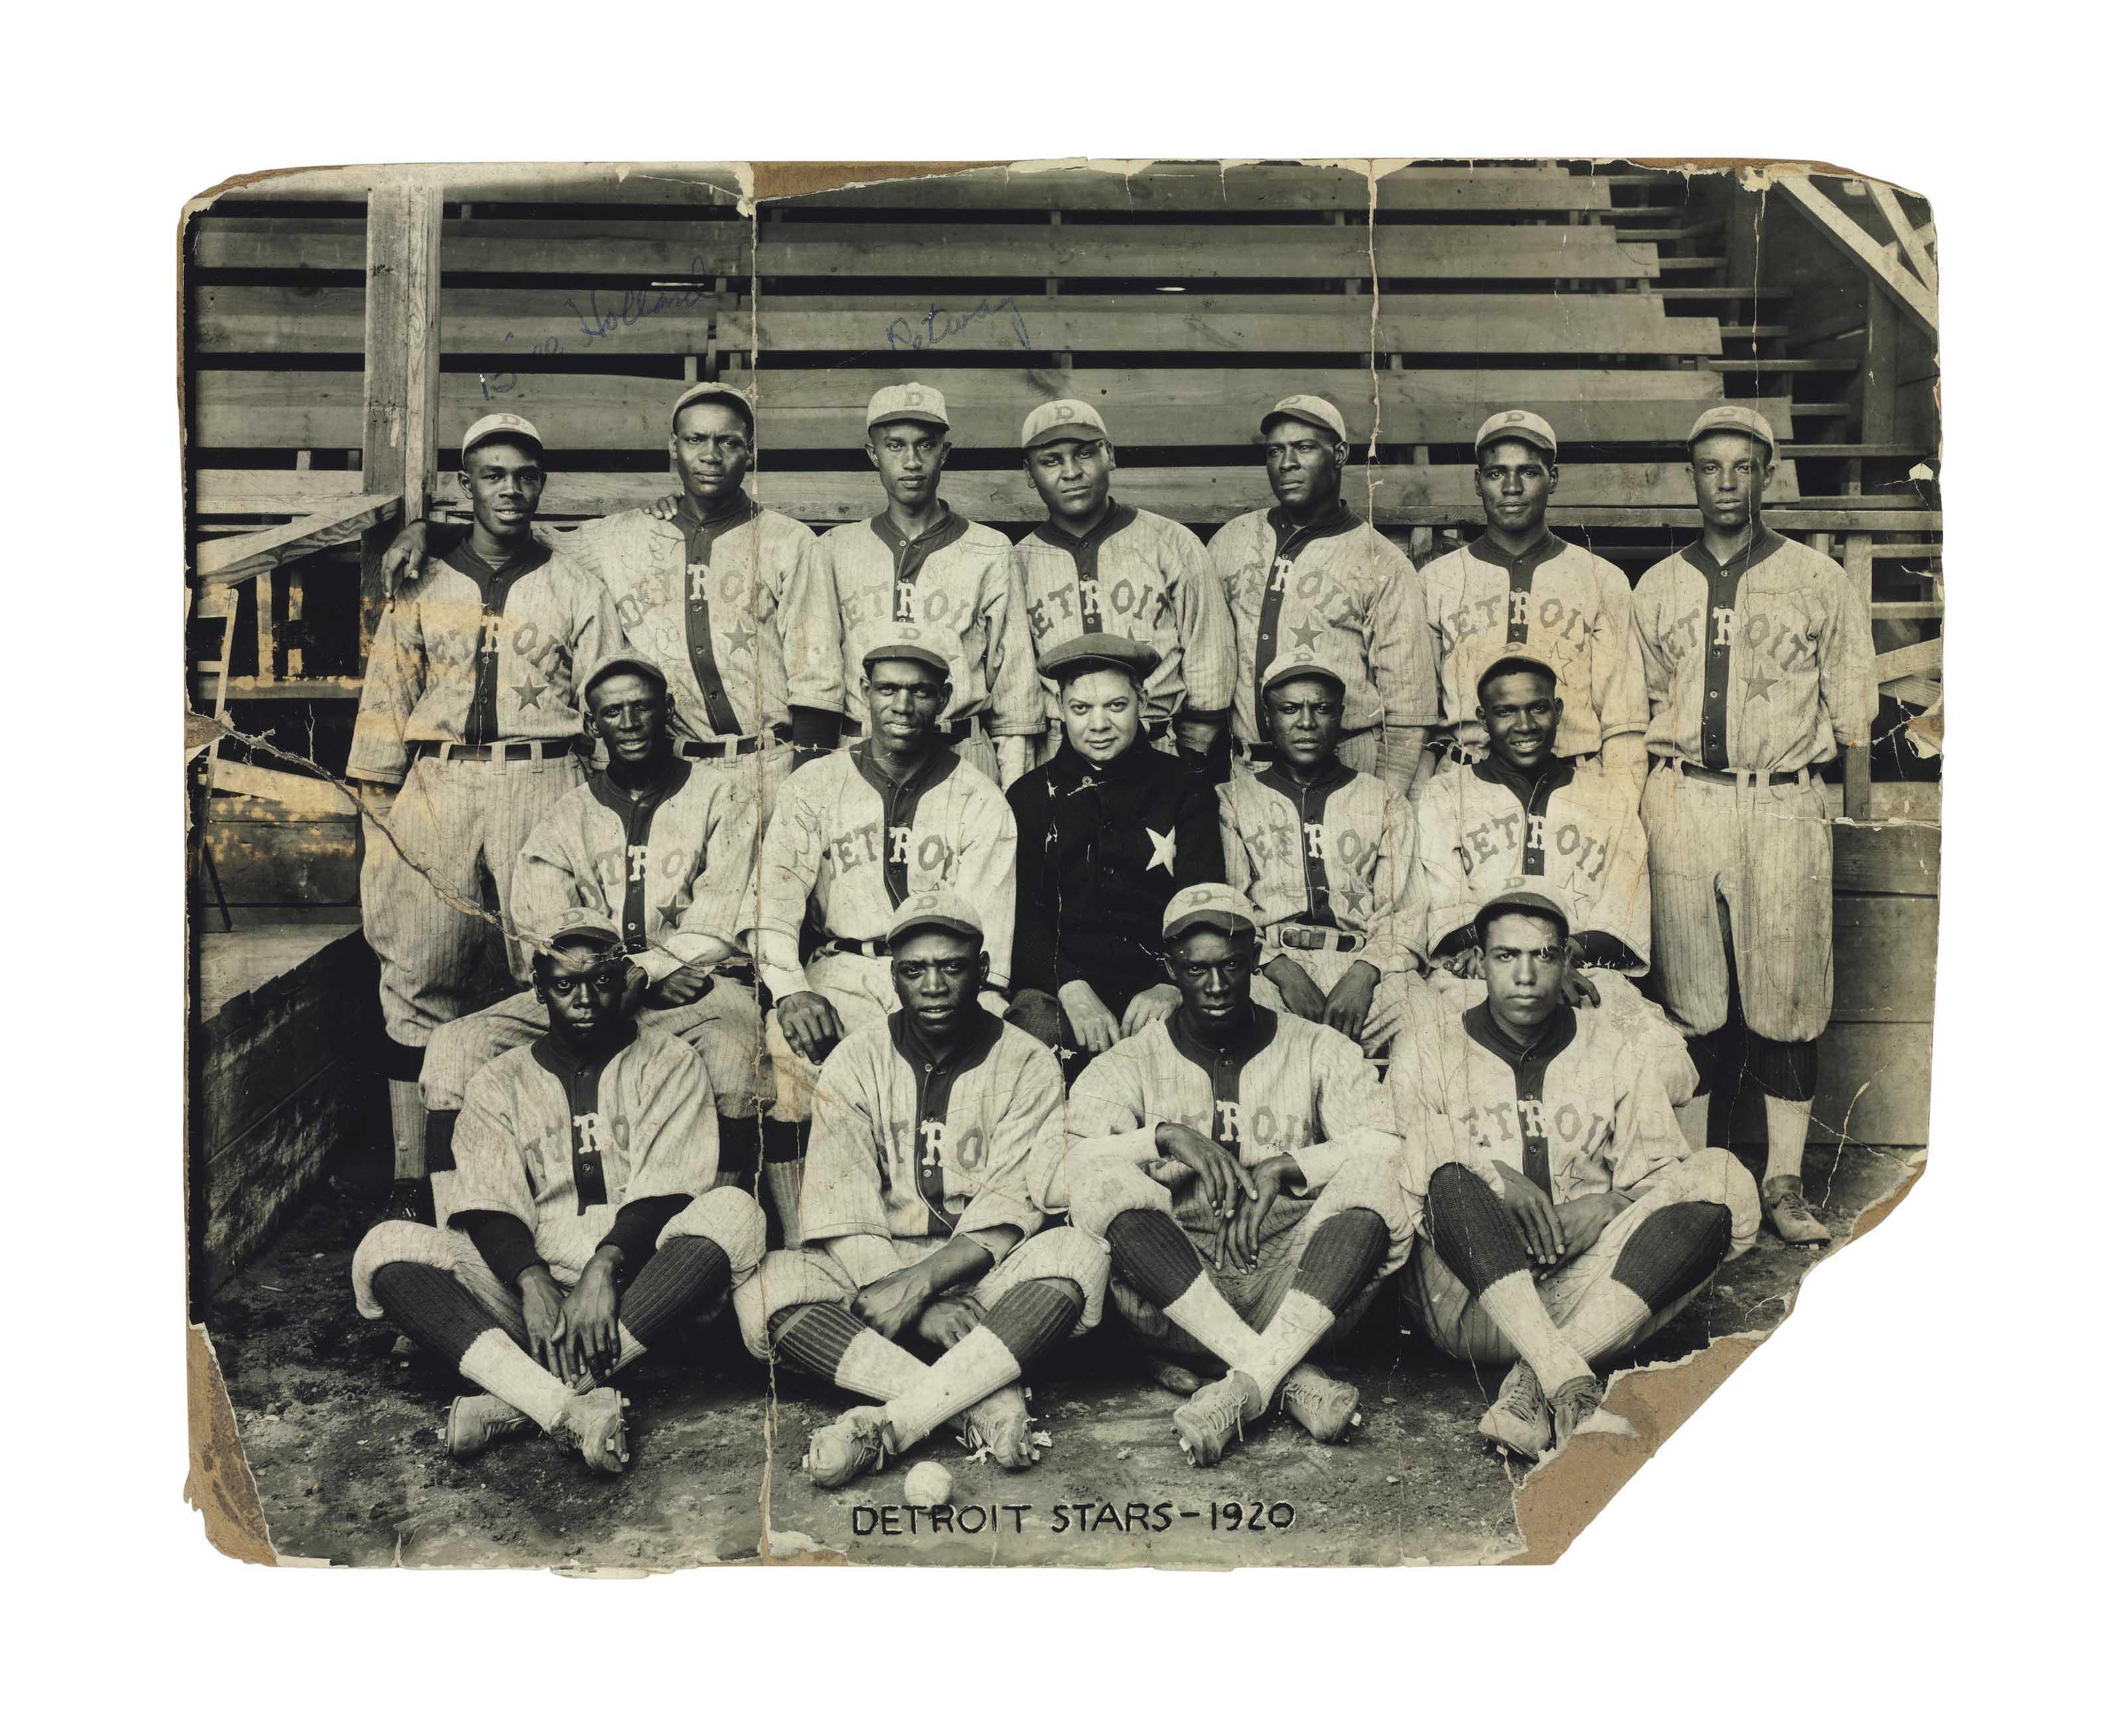 1920 DETROIT STARS TEAM PHOTOG